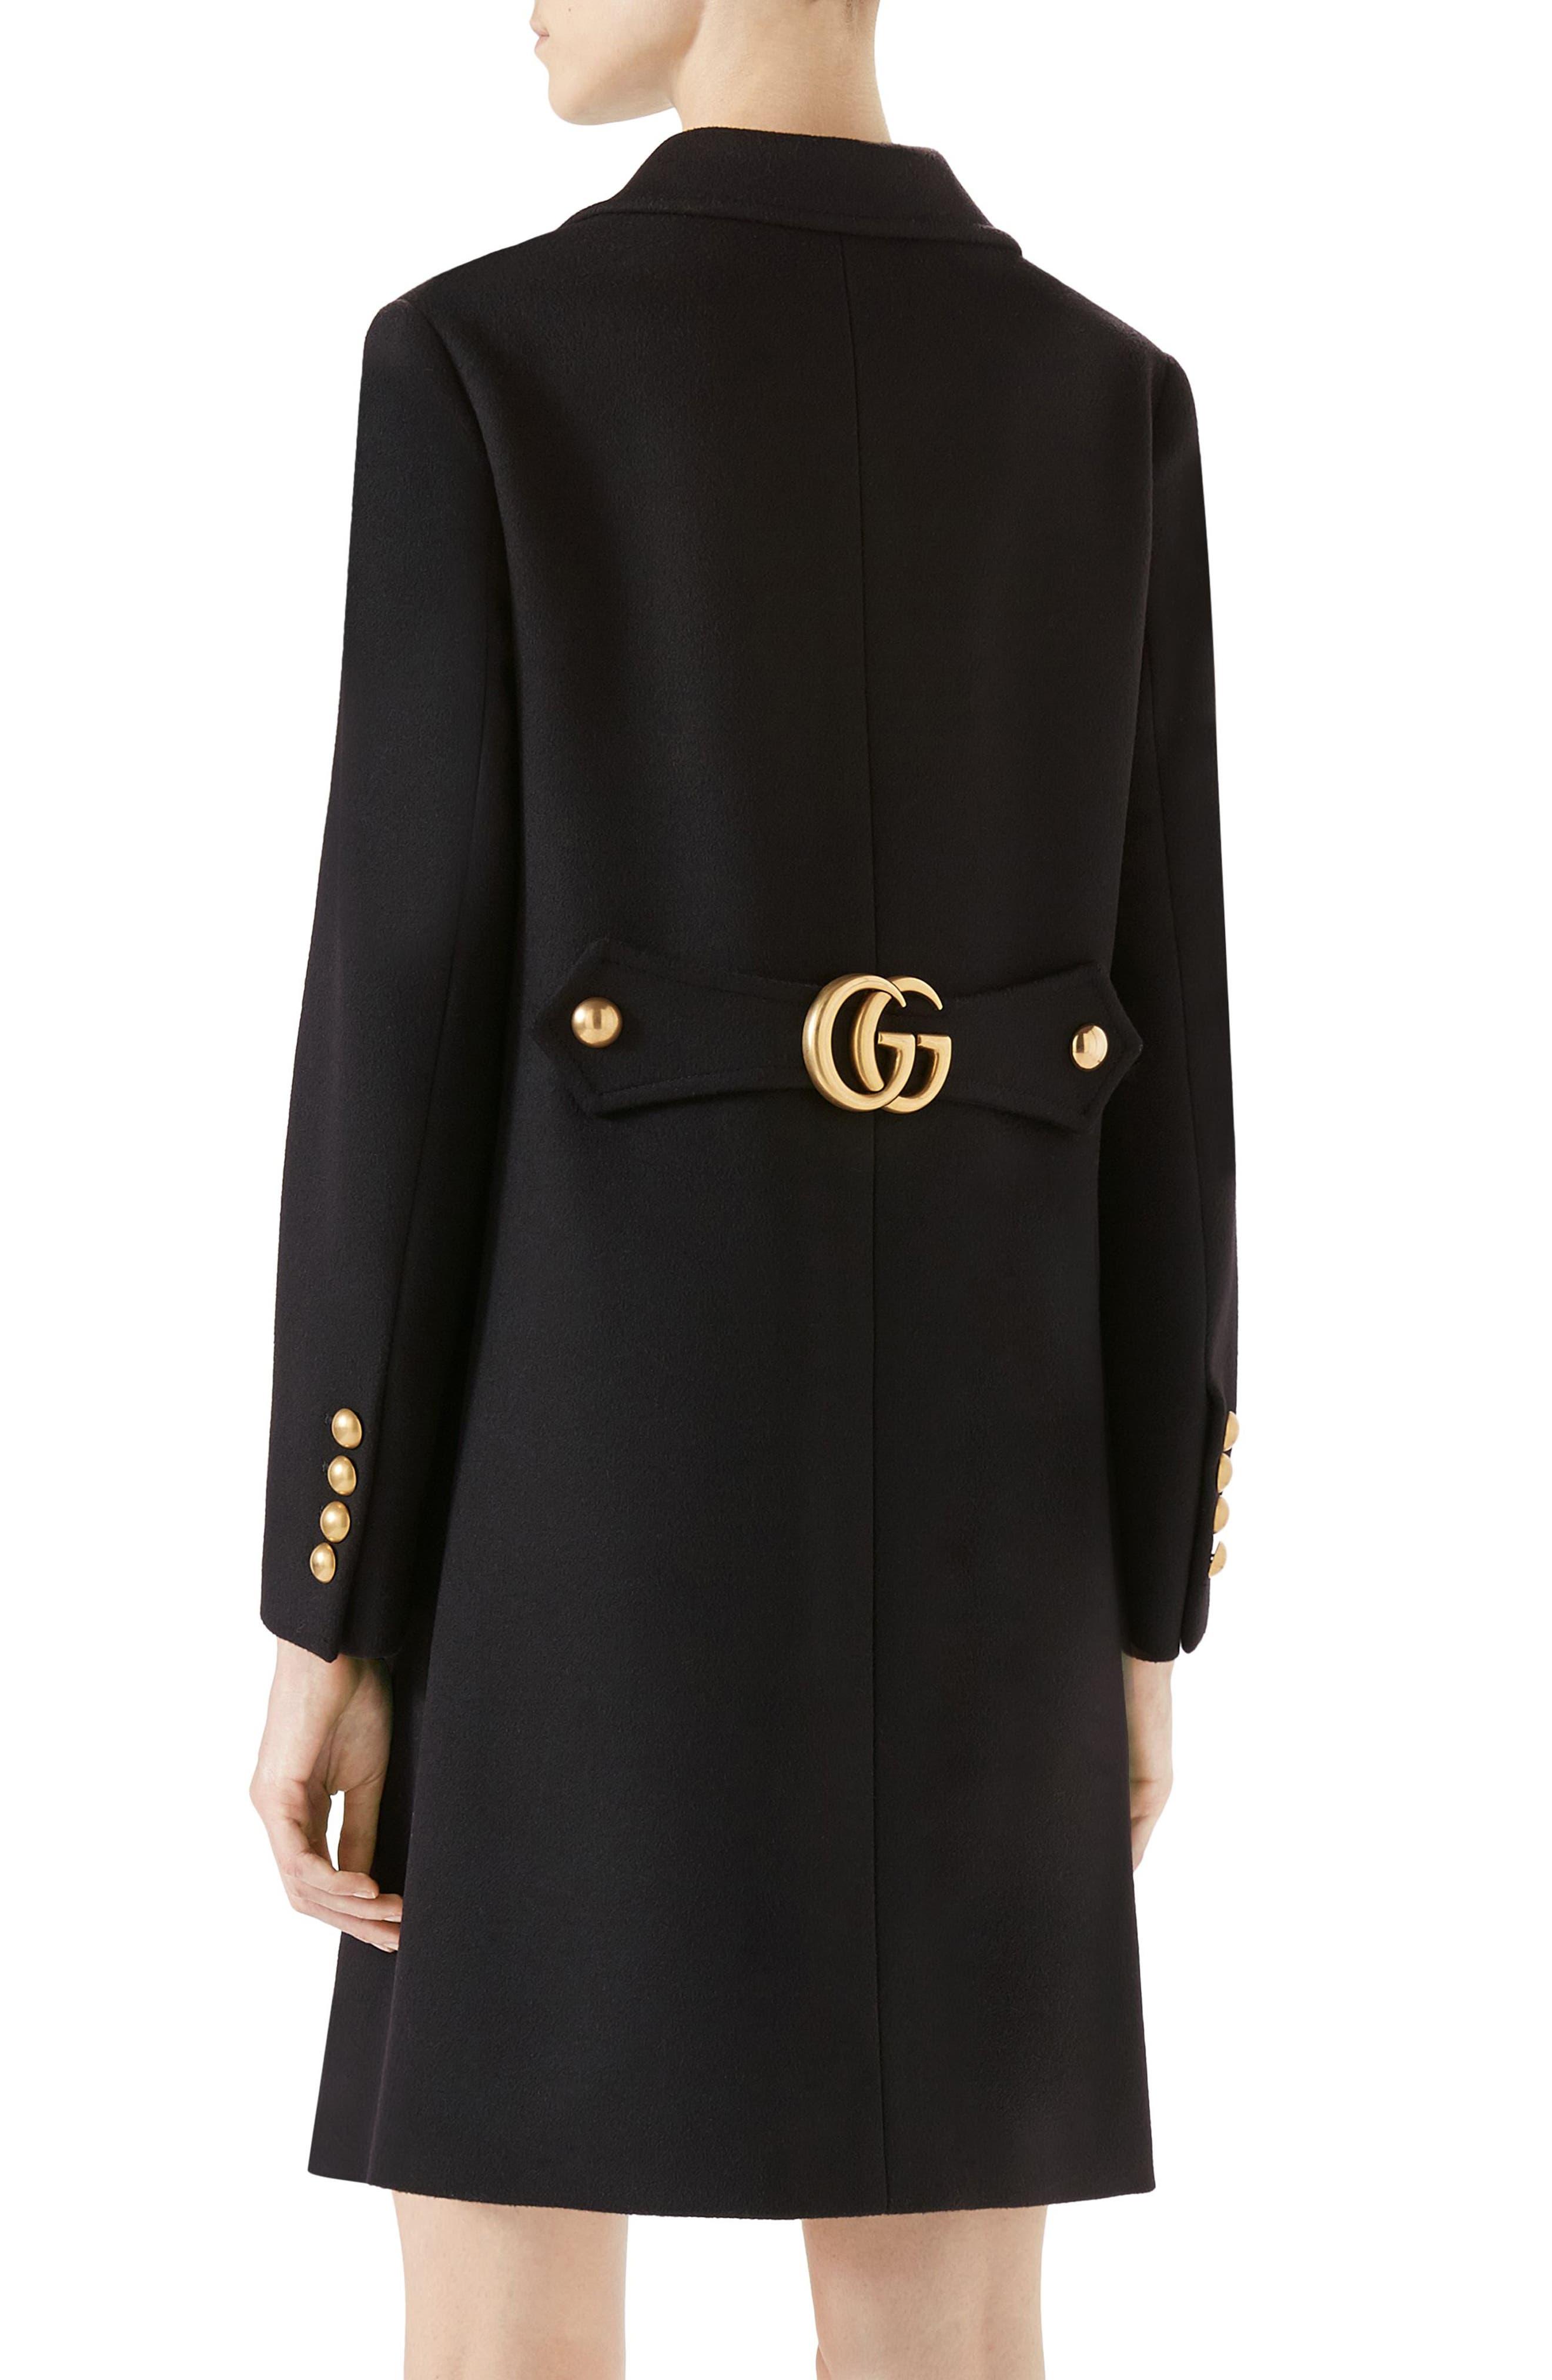 GG Wool Coat,                             Alternate thumbnail 2, color,                             Black